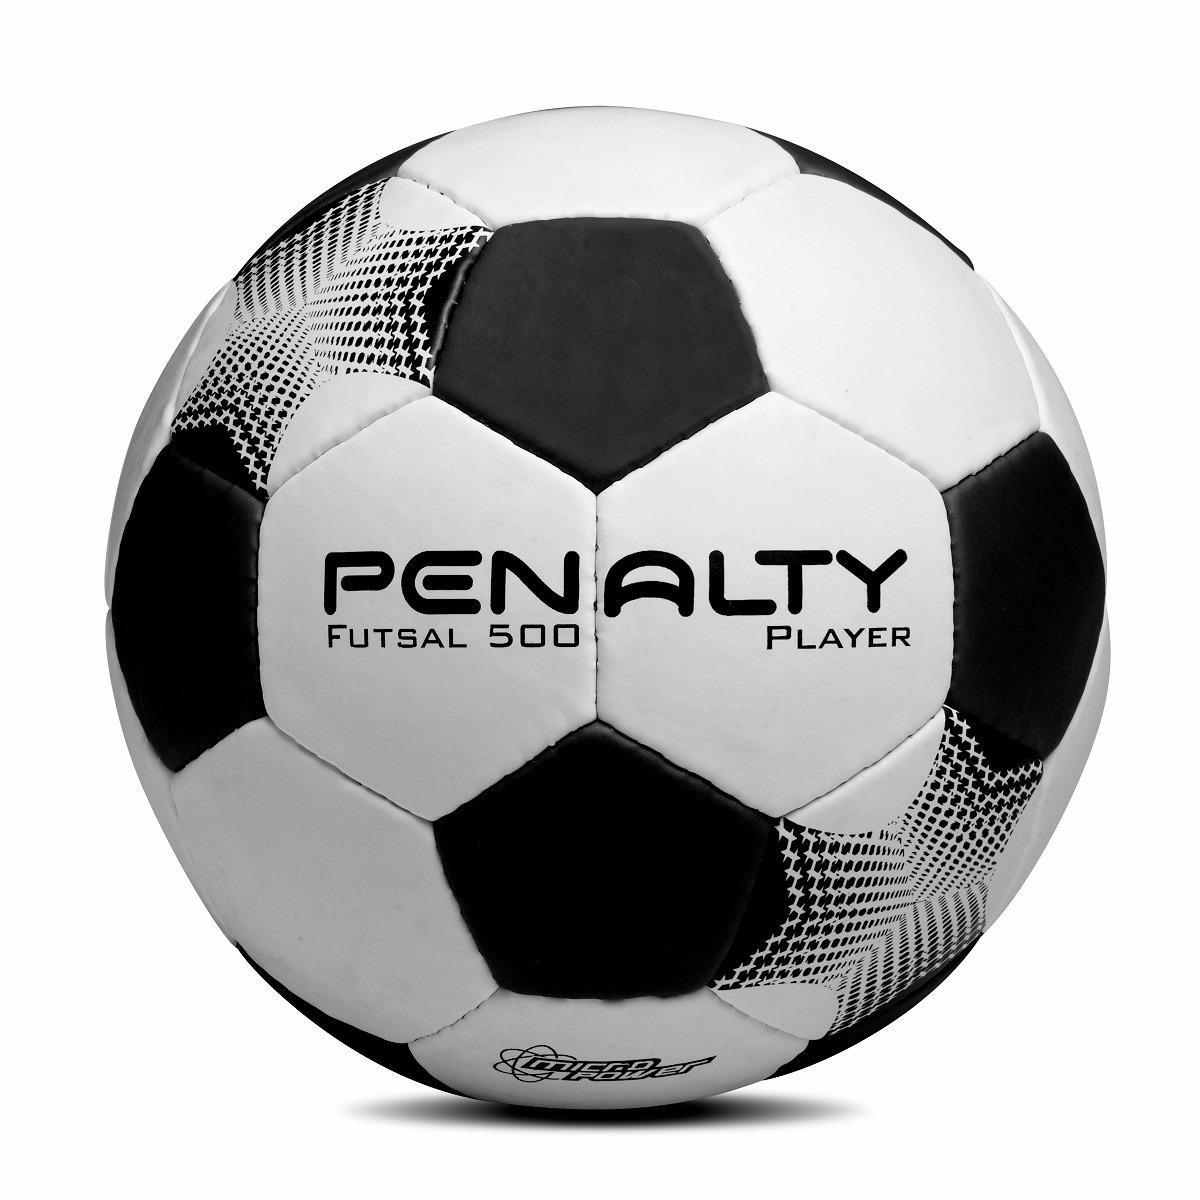 532366d42d Bola Futsal Penalty Player Costurada A Mão Original Bc-pt - R  69